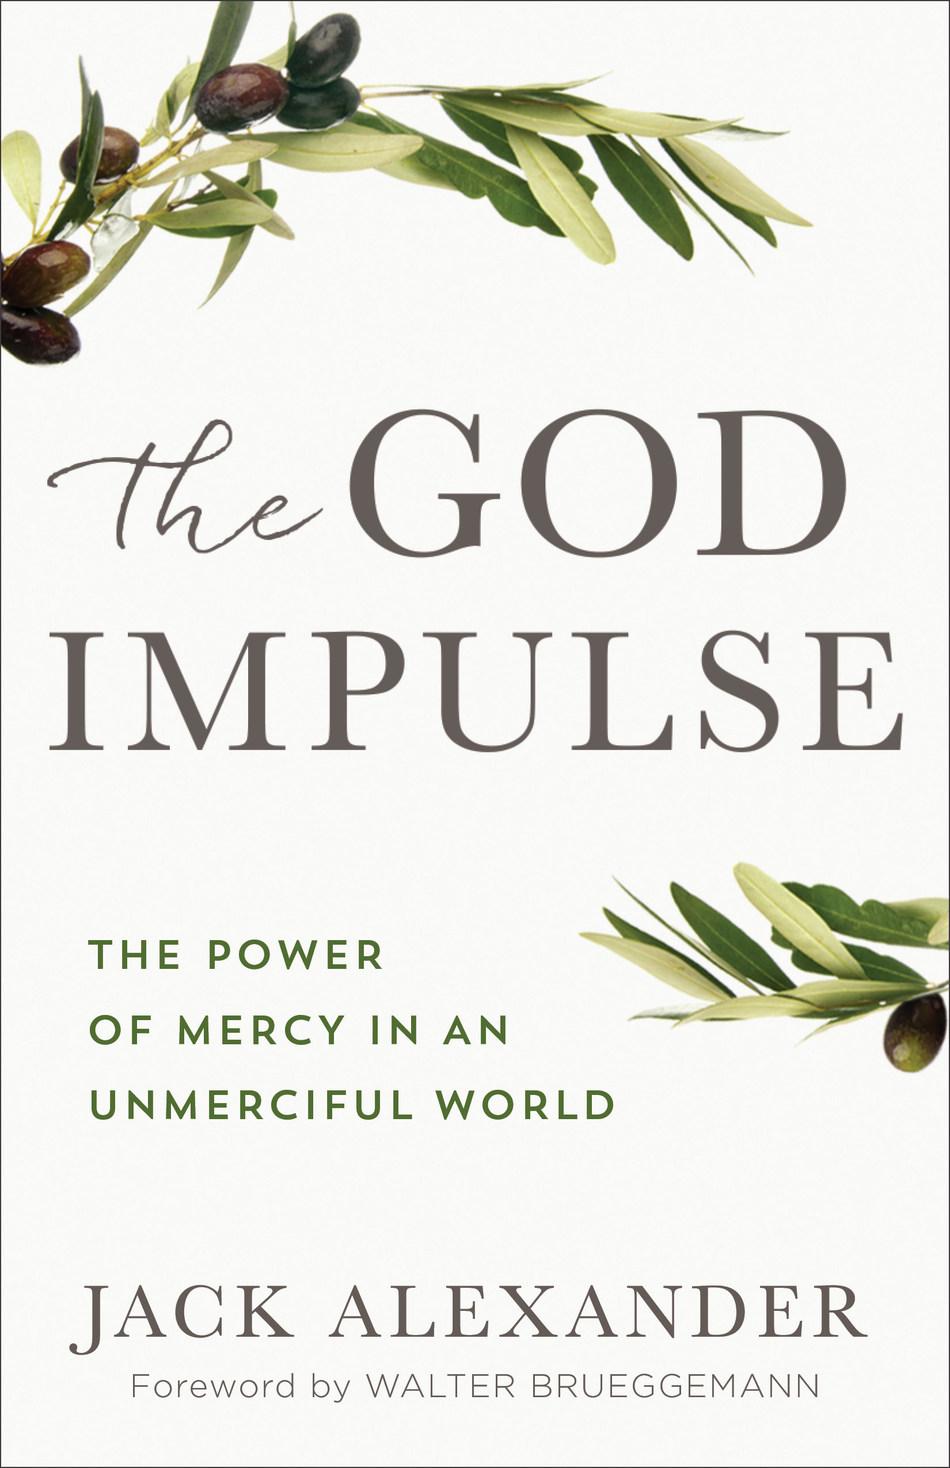 """The God Impulse"" by Jack Alexander, July 31, 2018 Release (PRNewsfoto/Jack Alexander)"